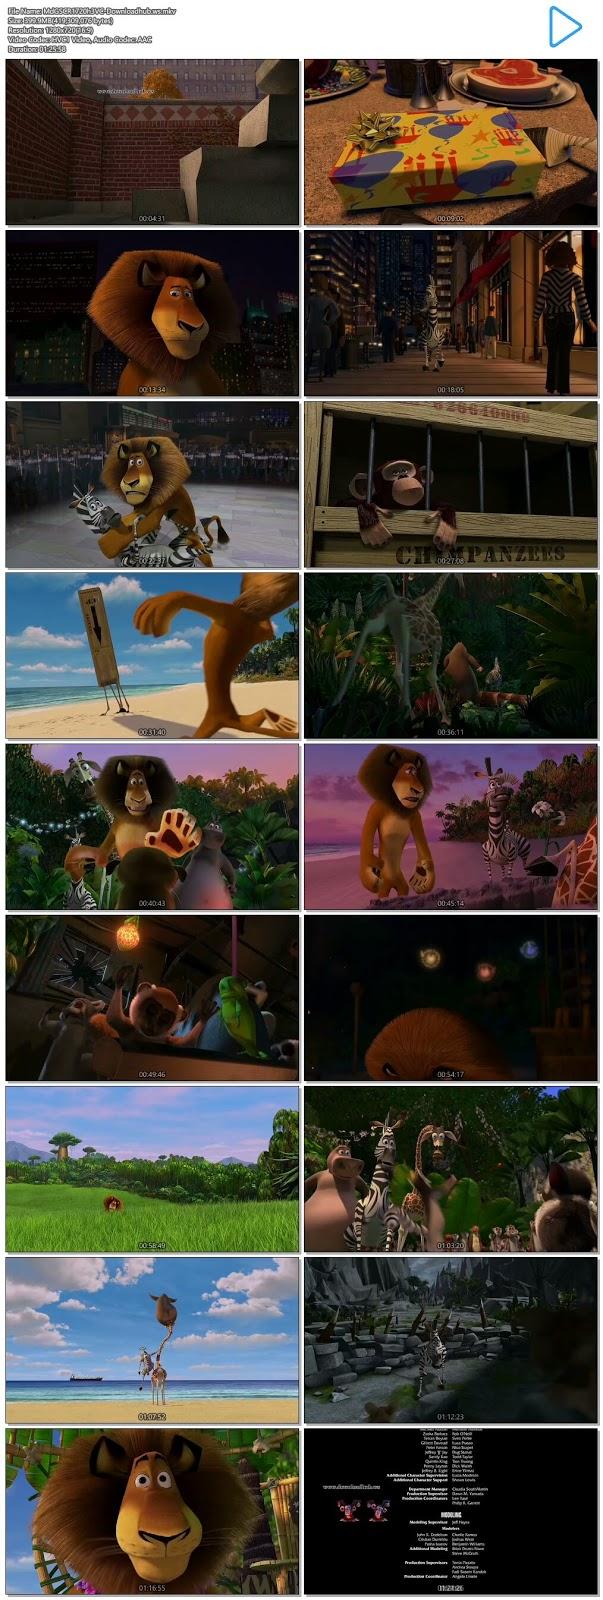 Madagascar 2005 Hindi Dual Audio 720p HEVC BluRay Free Download